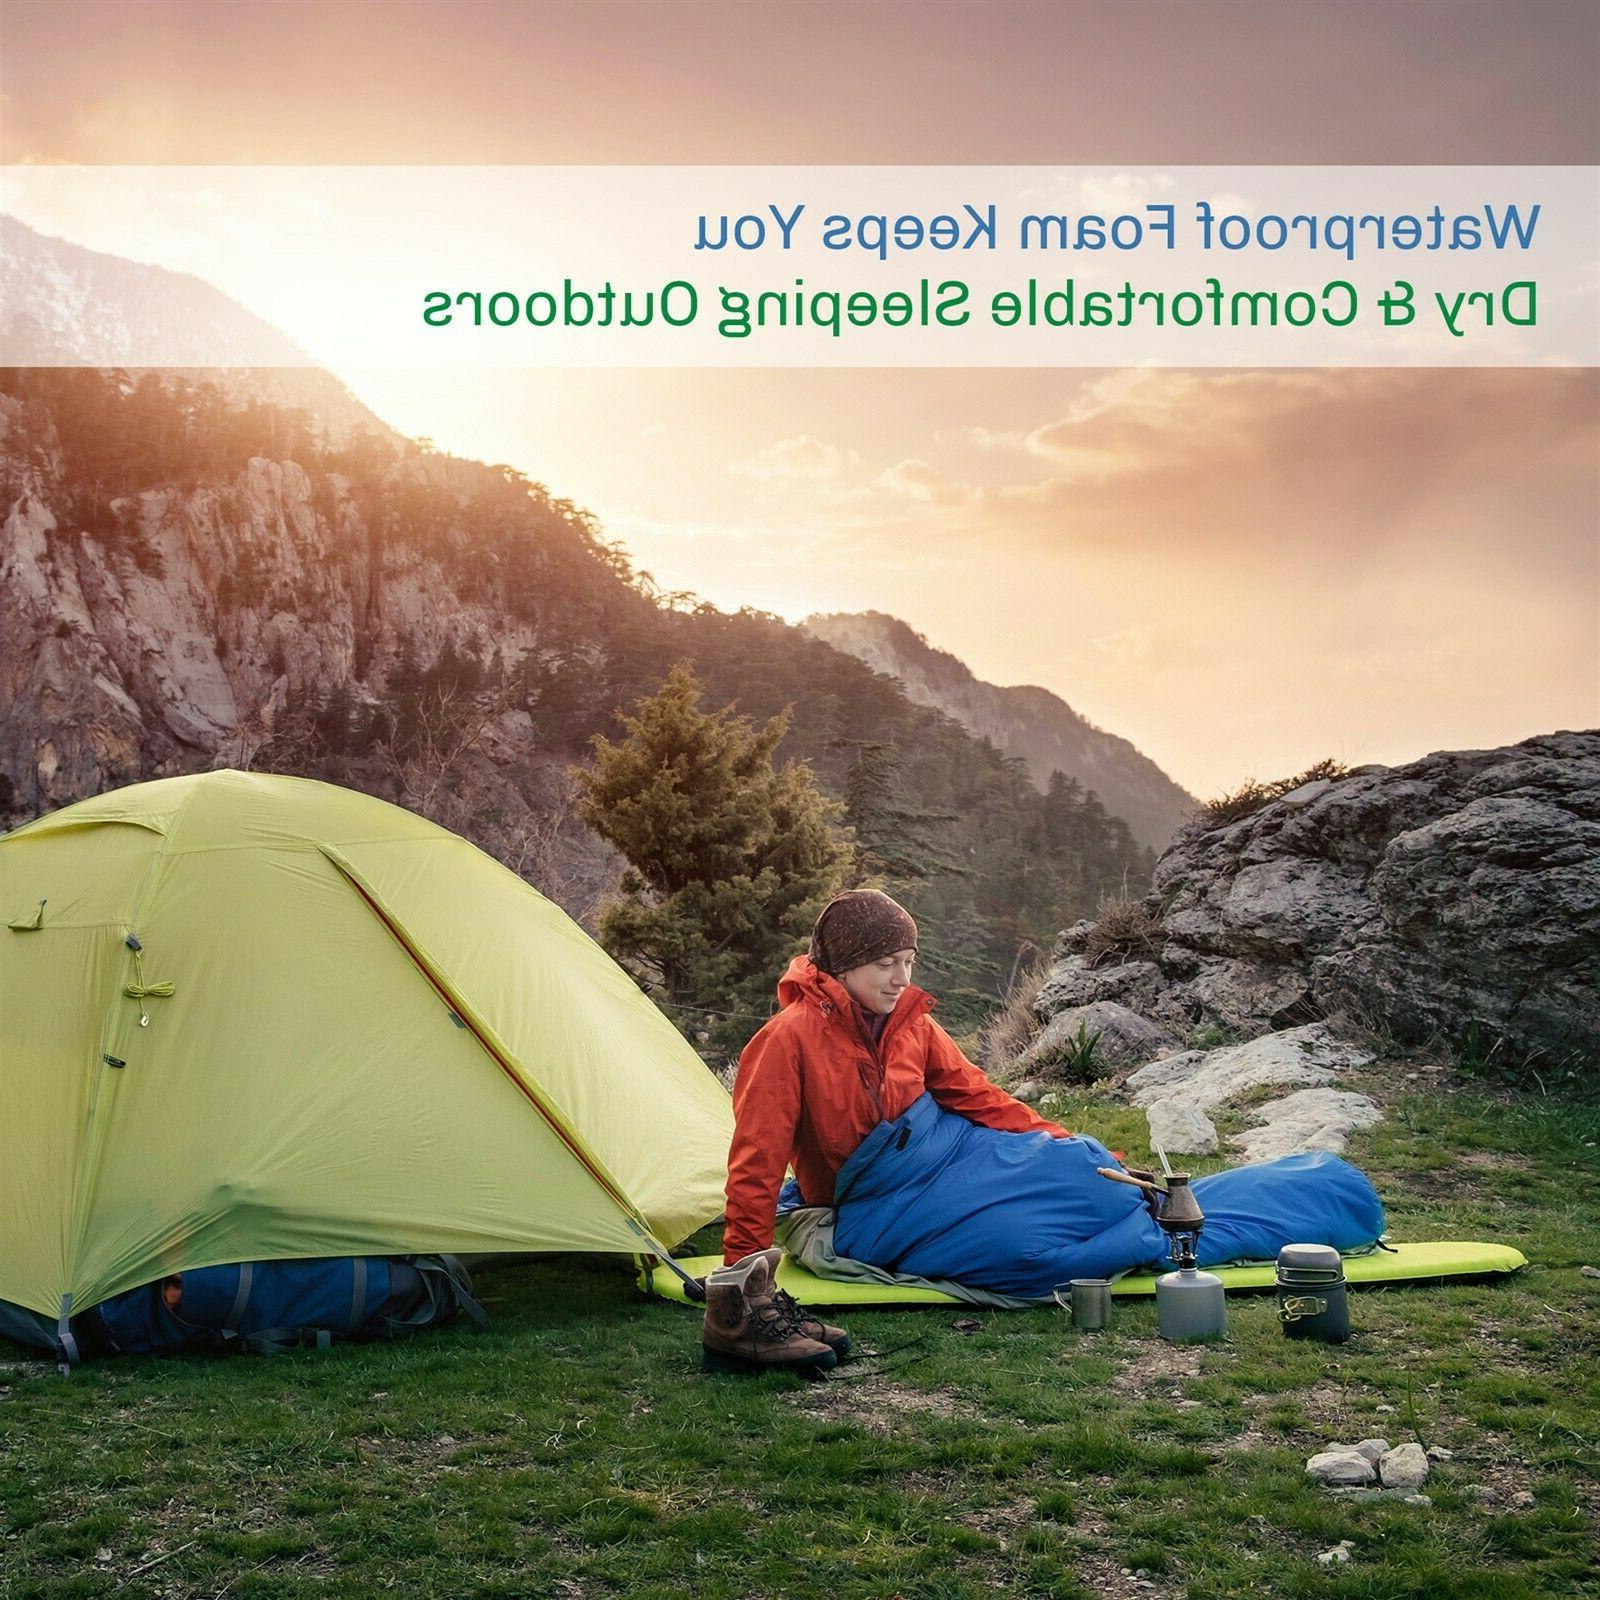 Camping Sleeping 1.25 Padding Foam Travel Pad